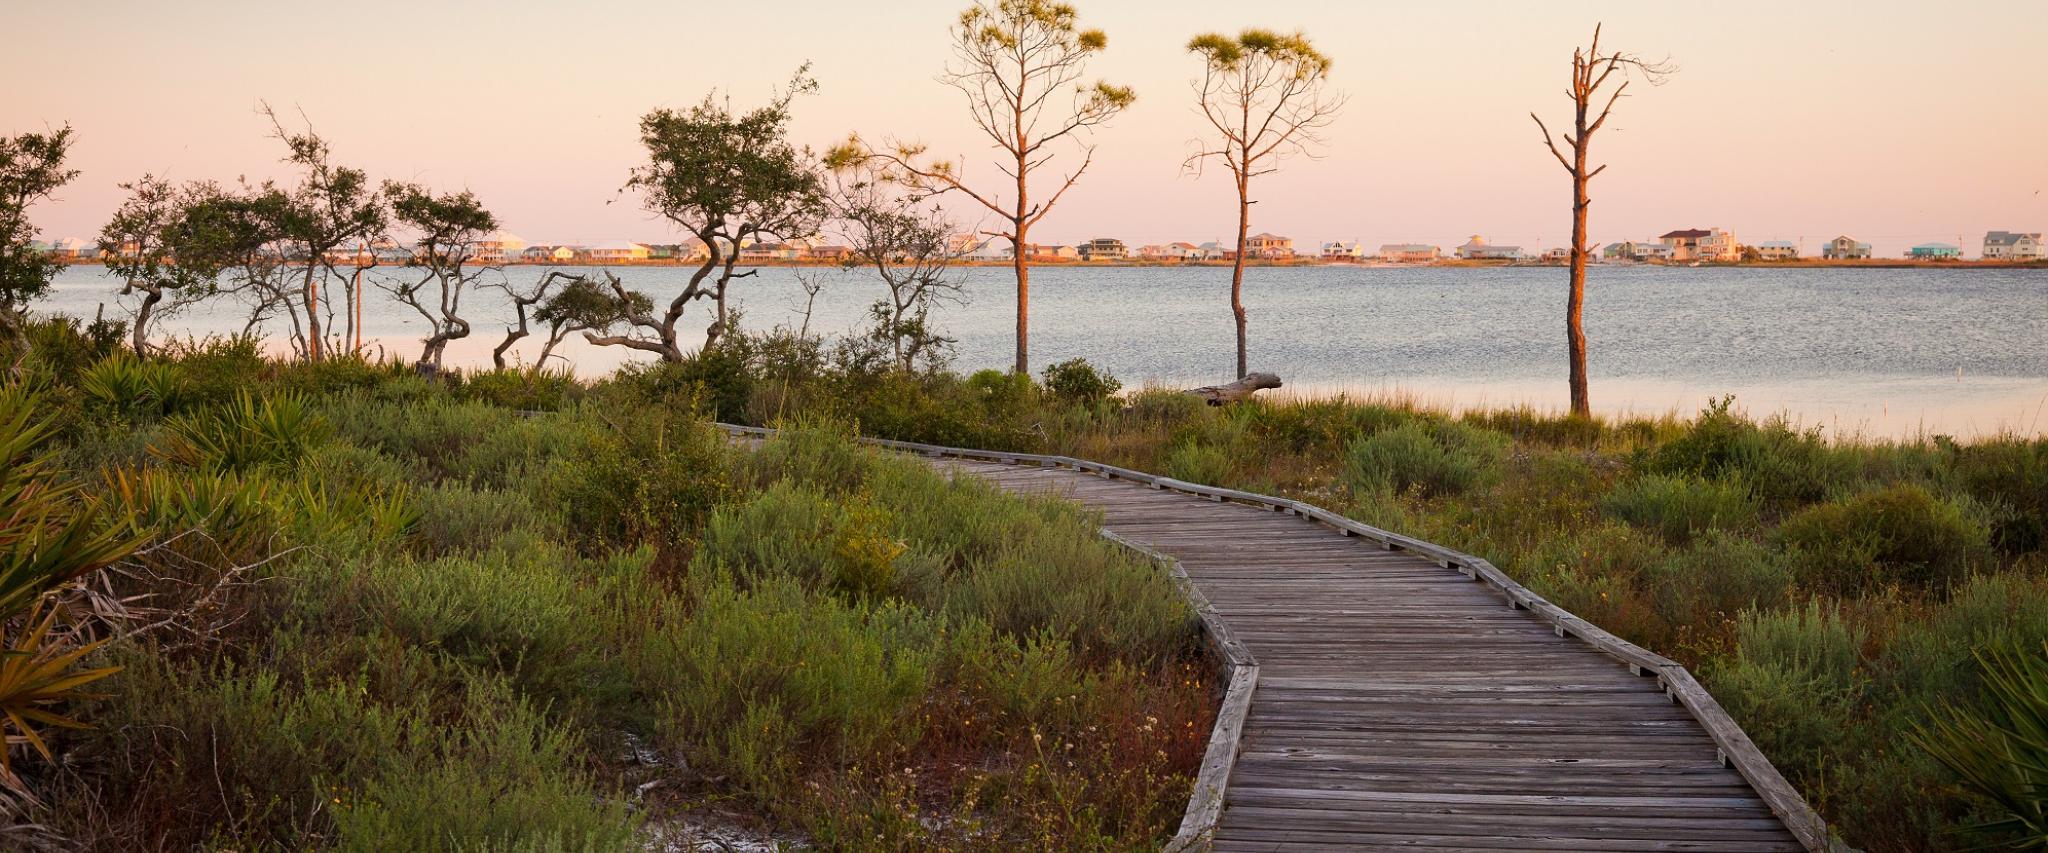 Top 25 Parks In Gulf Shores Amp Orange Beach Alabama Tourism